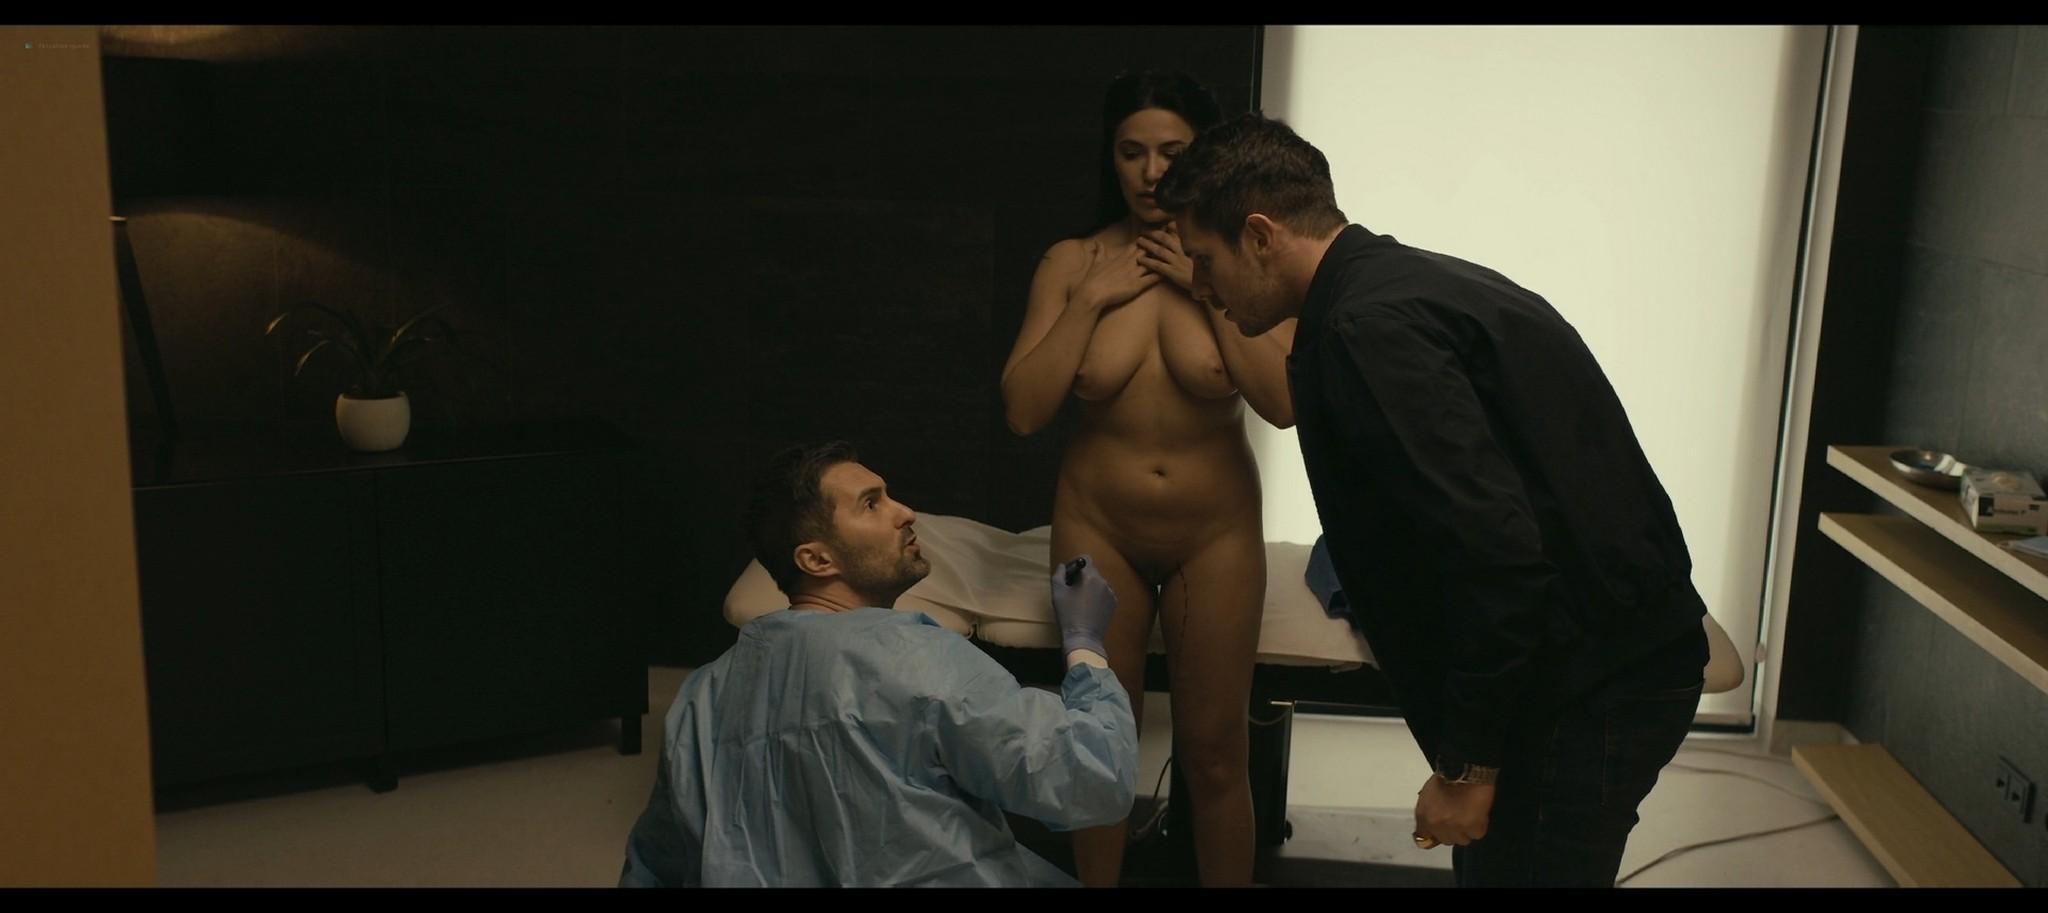 Katarzyna Warnke sex Aleksandra Nowicka Karolina Dziuba nude Petla PL 2020 1080 BluRay 14